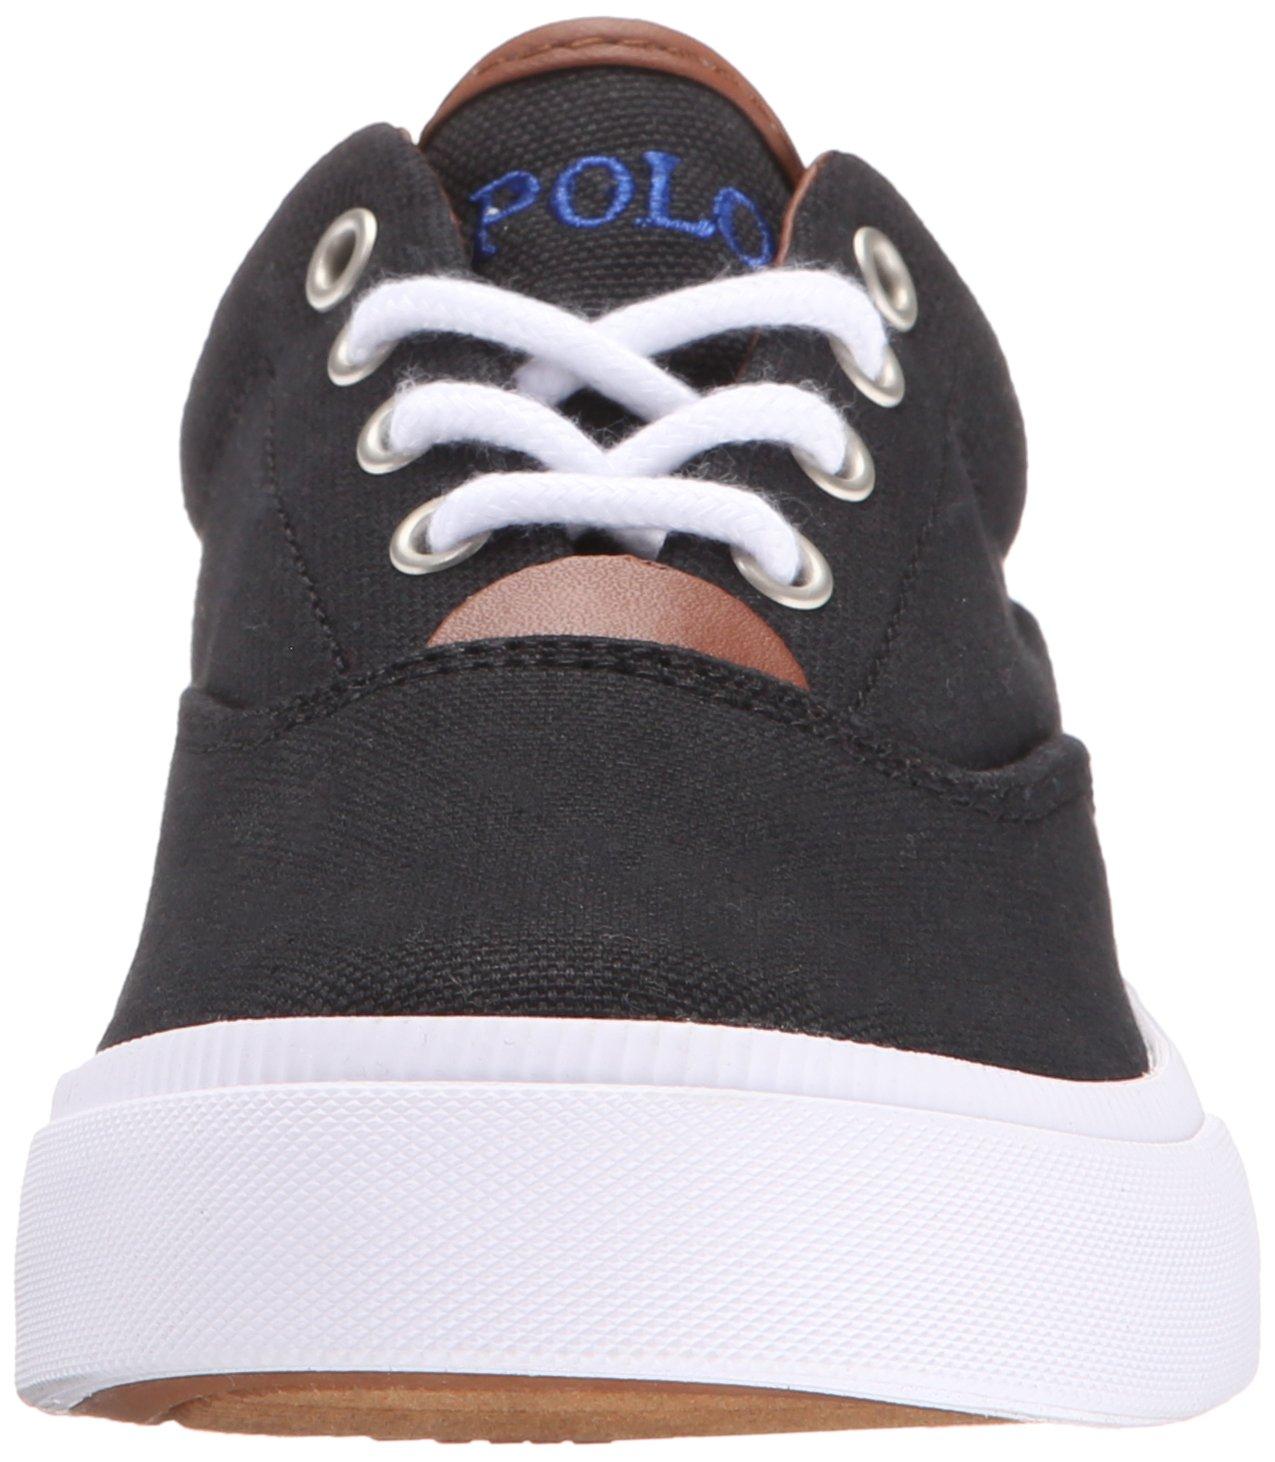 Polo Ralph Lauren Ralph Kids Kid/Big Vaughn II Fashion Black Sneaker  (Little Kid/Big Kid) Black 923c830